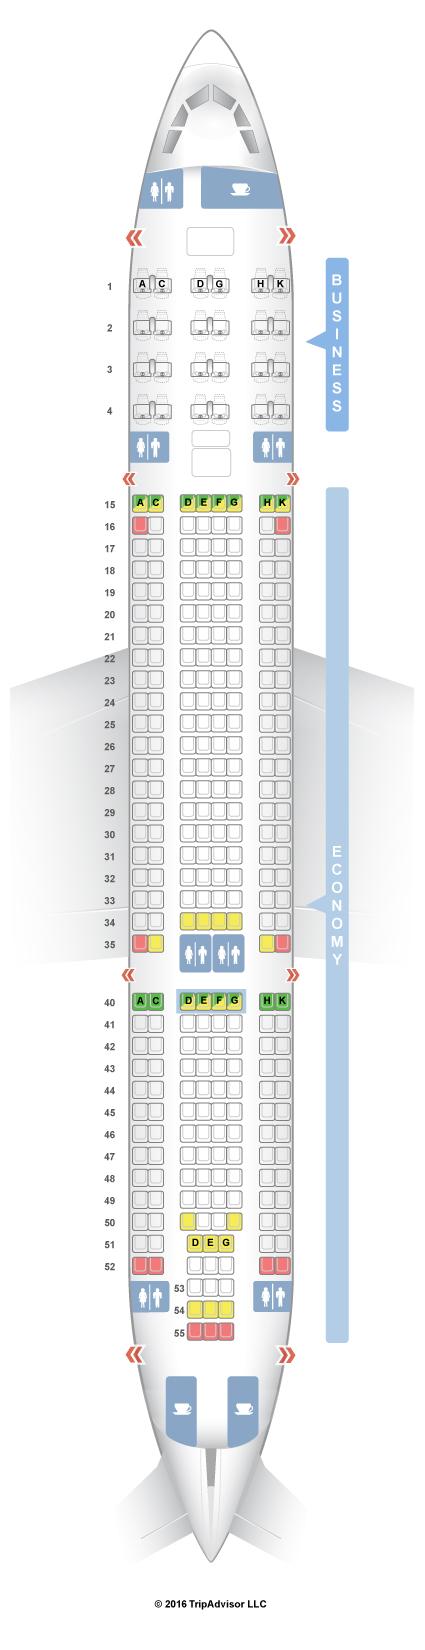 Air Tahiti Nui Seat Map